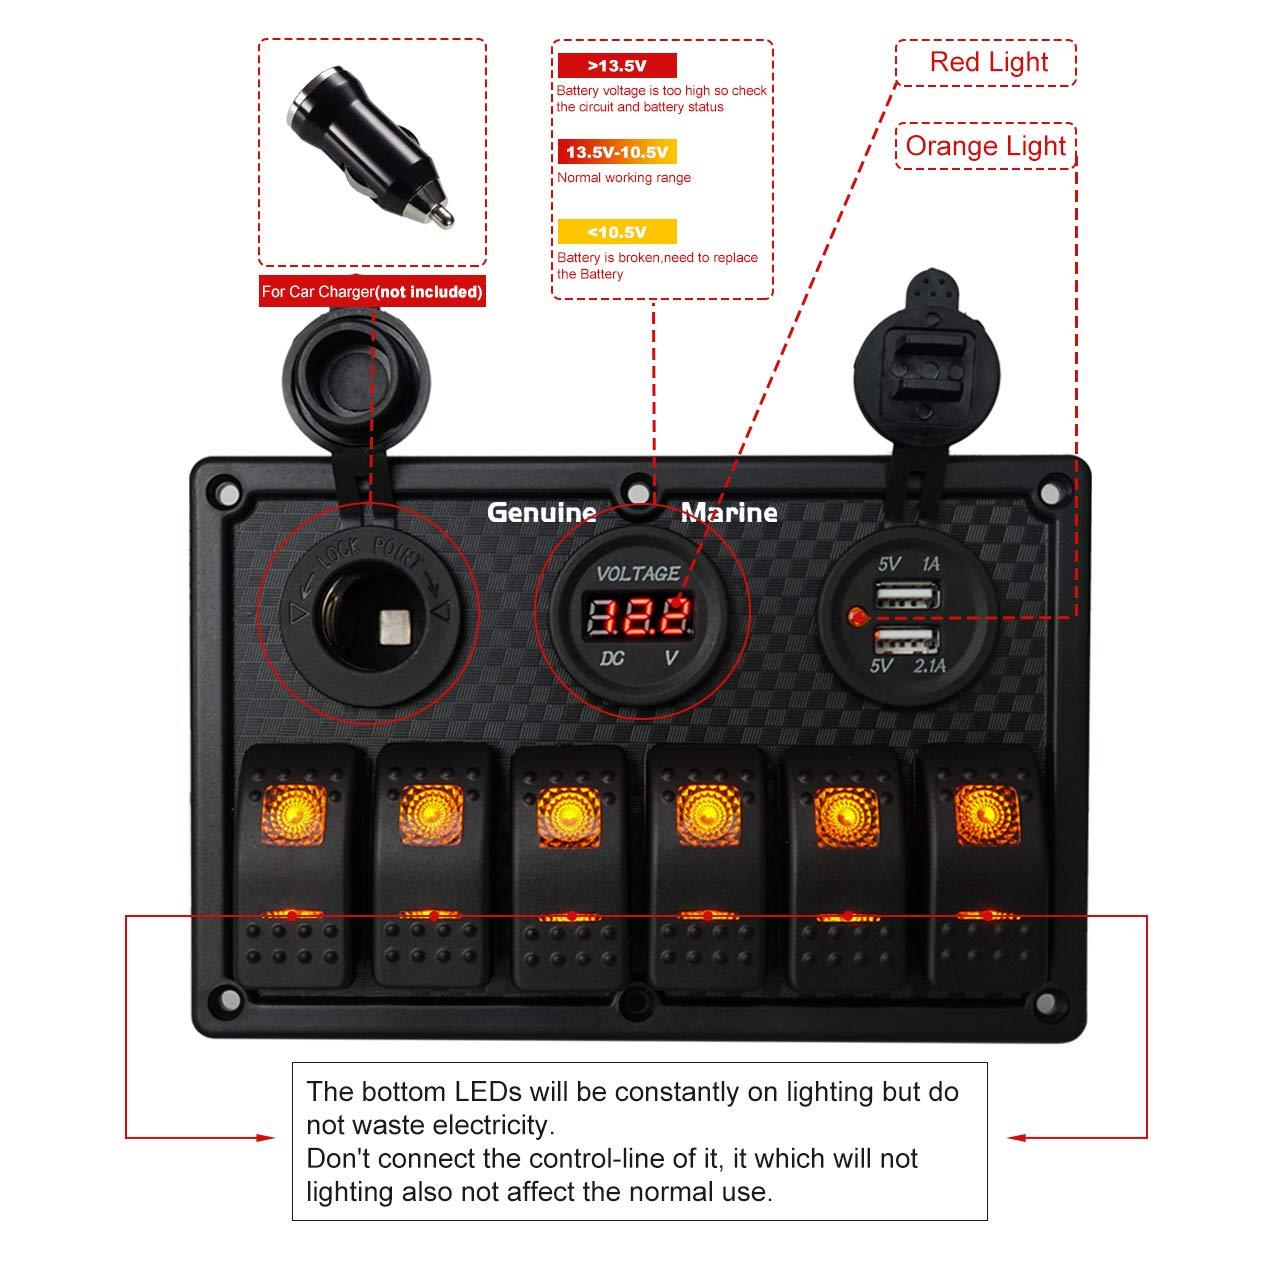 6 8 Gang Rocker Switch Panel Digital Voltmeter Display Dual 5v Schematic Diagram Of Dashboard Usb